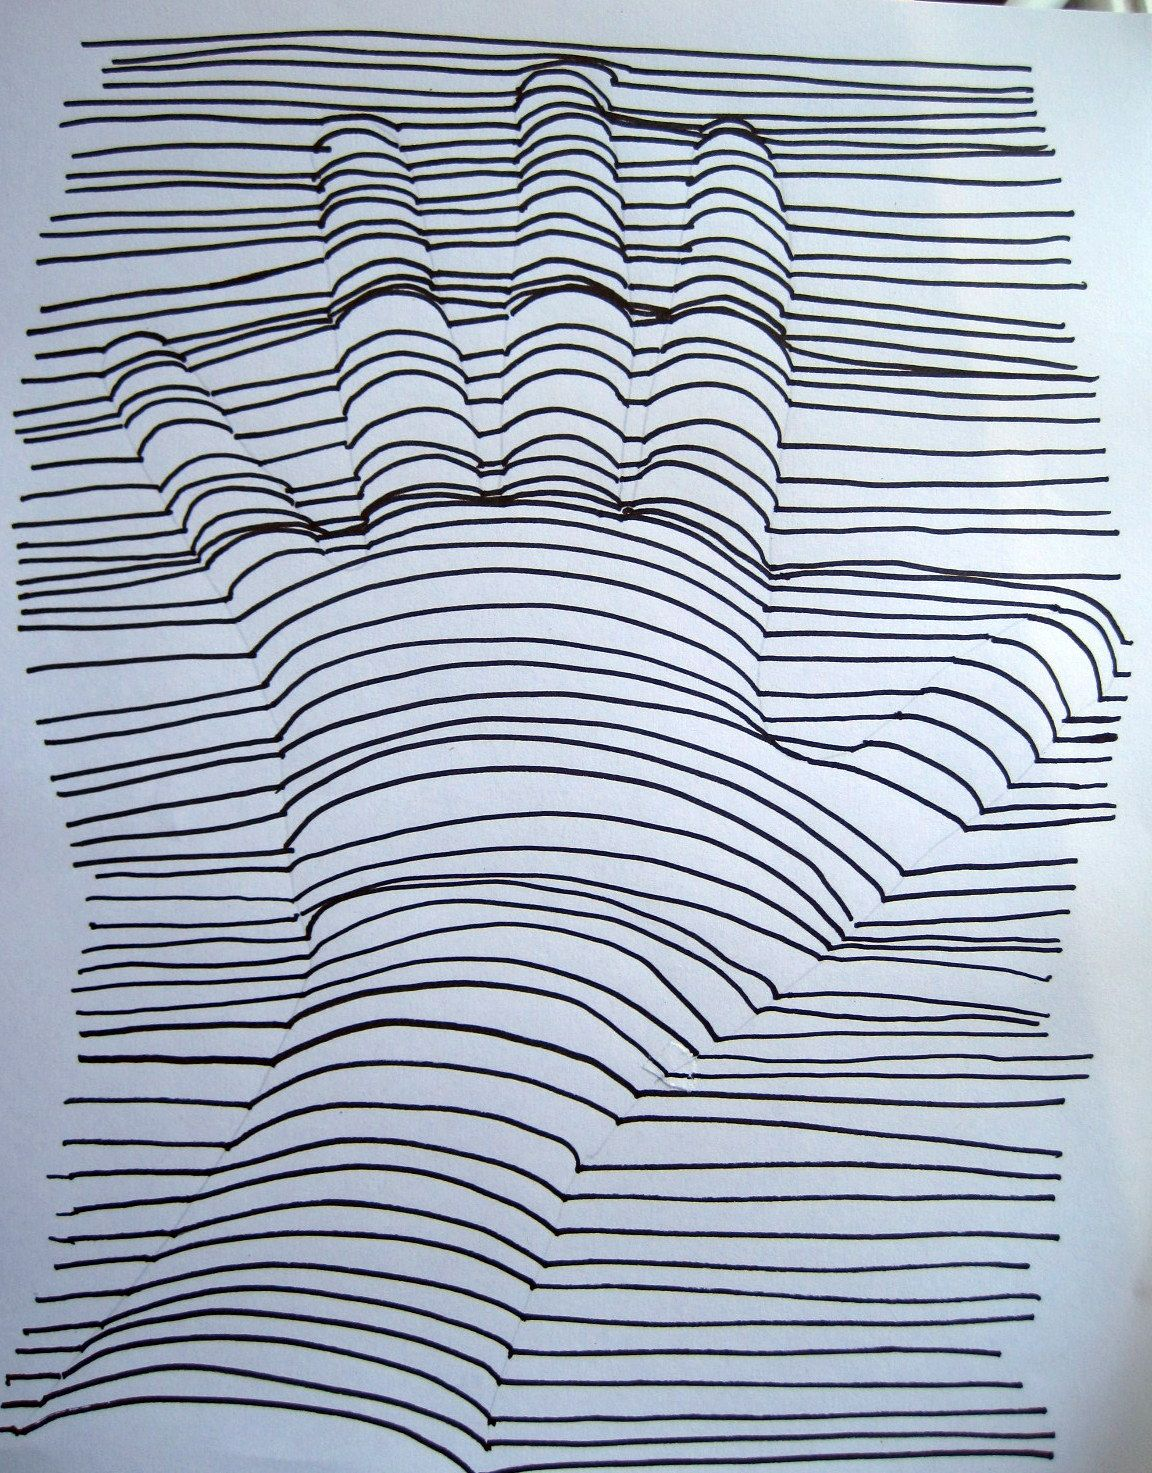 3-D Hand Drawing | D, Hand drawings and Drawings